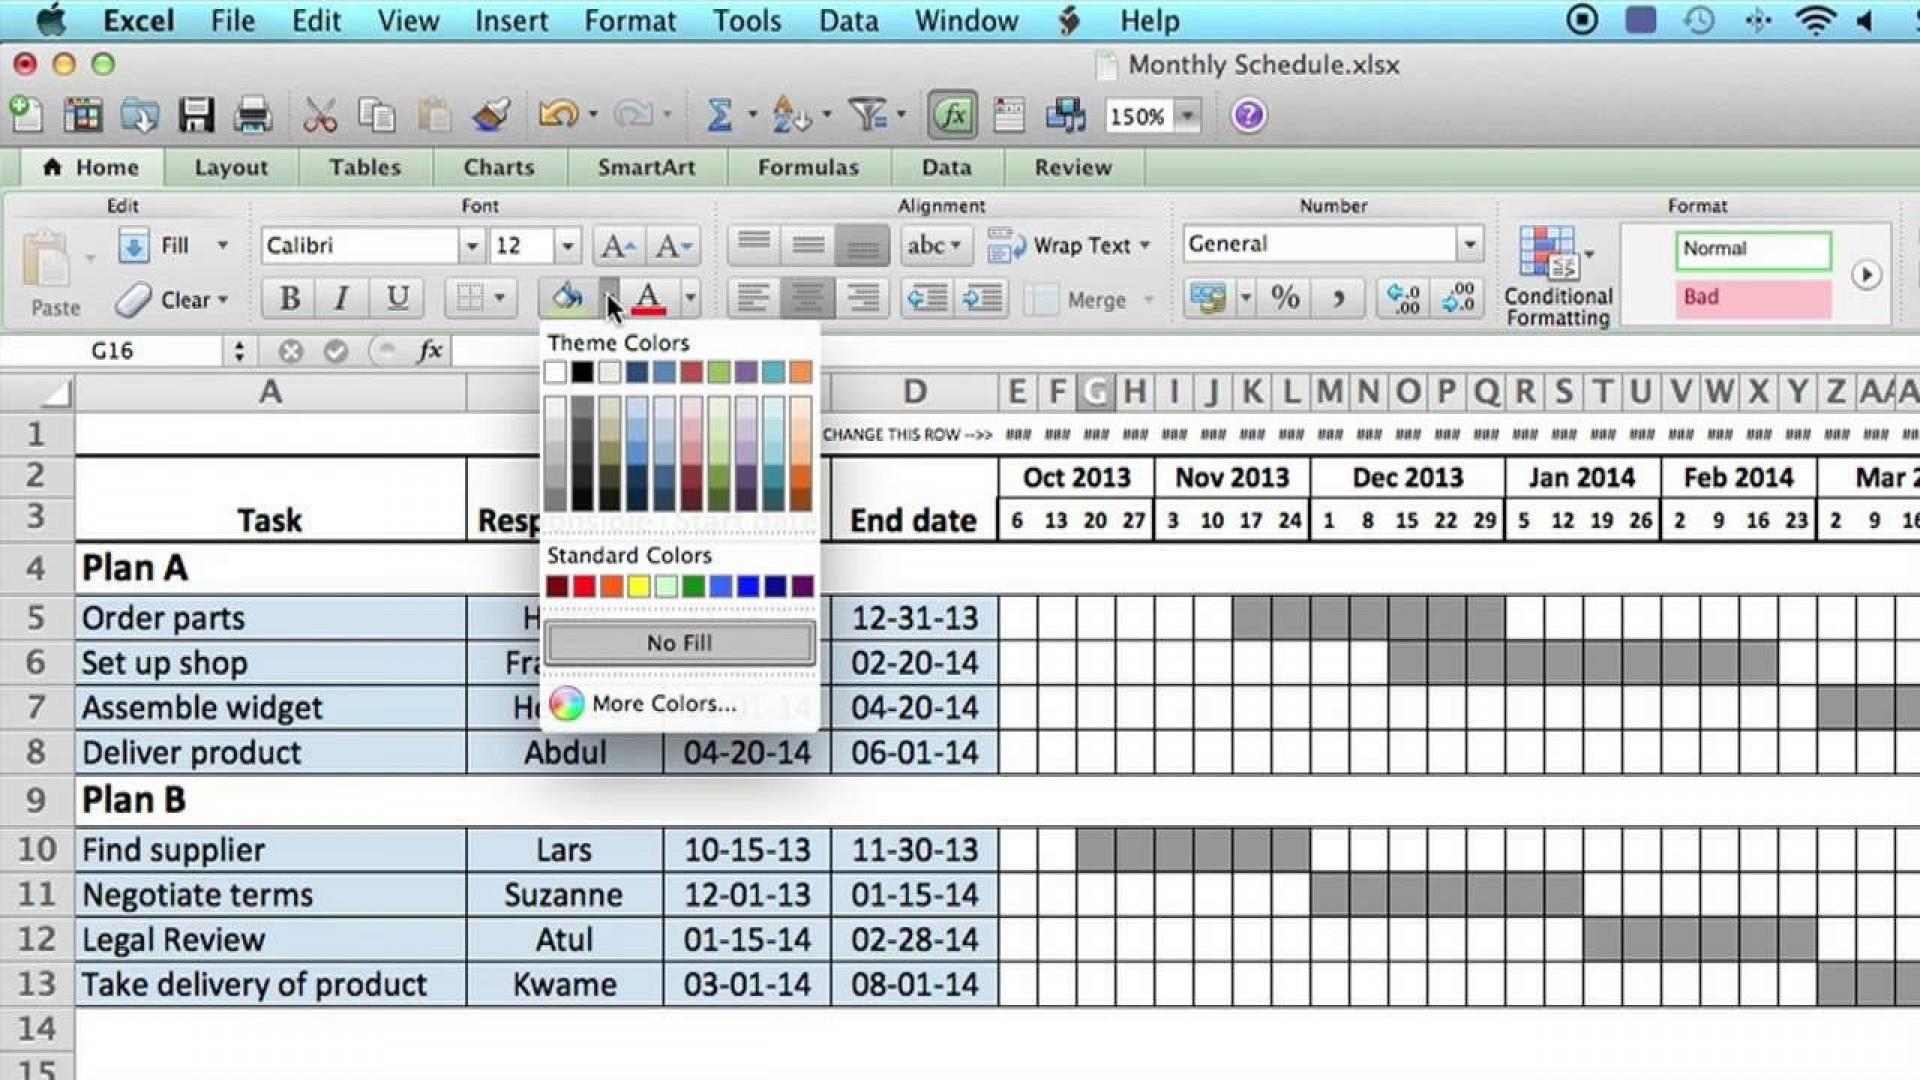 006 Stupendou Excel Work Planner Template Sample  Microsoft Monthly Schedule Plan Scheduling1920